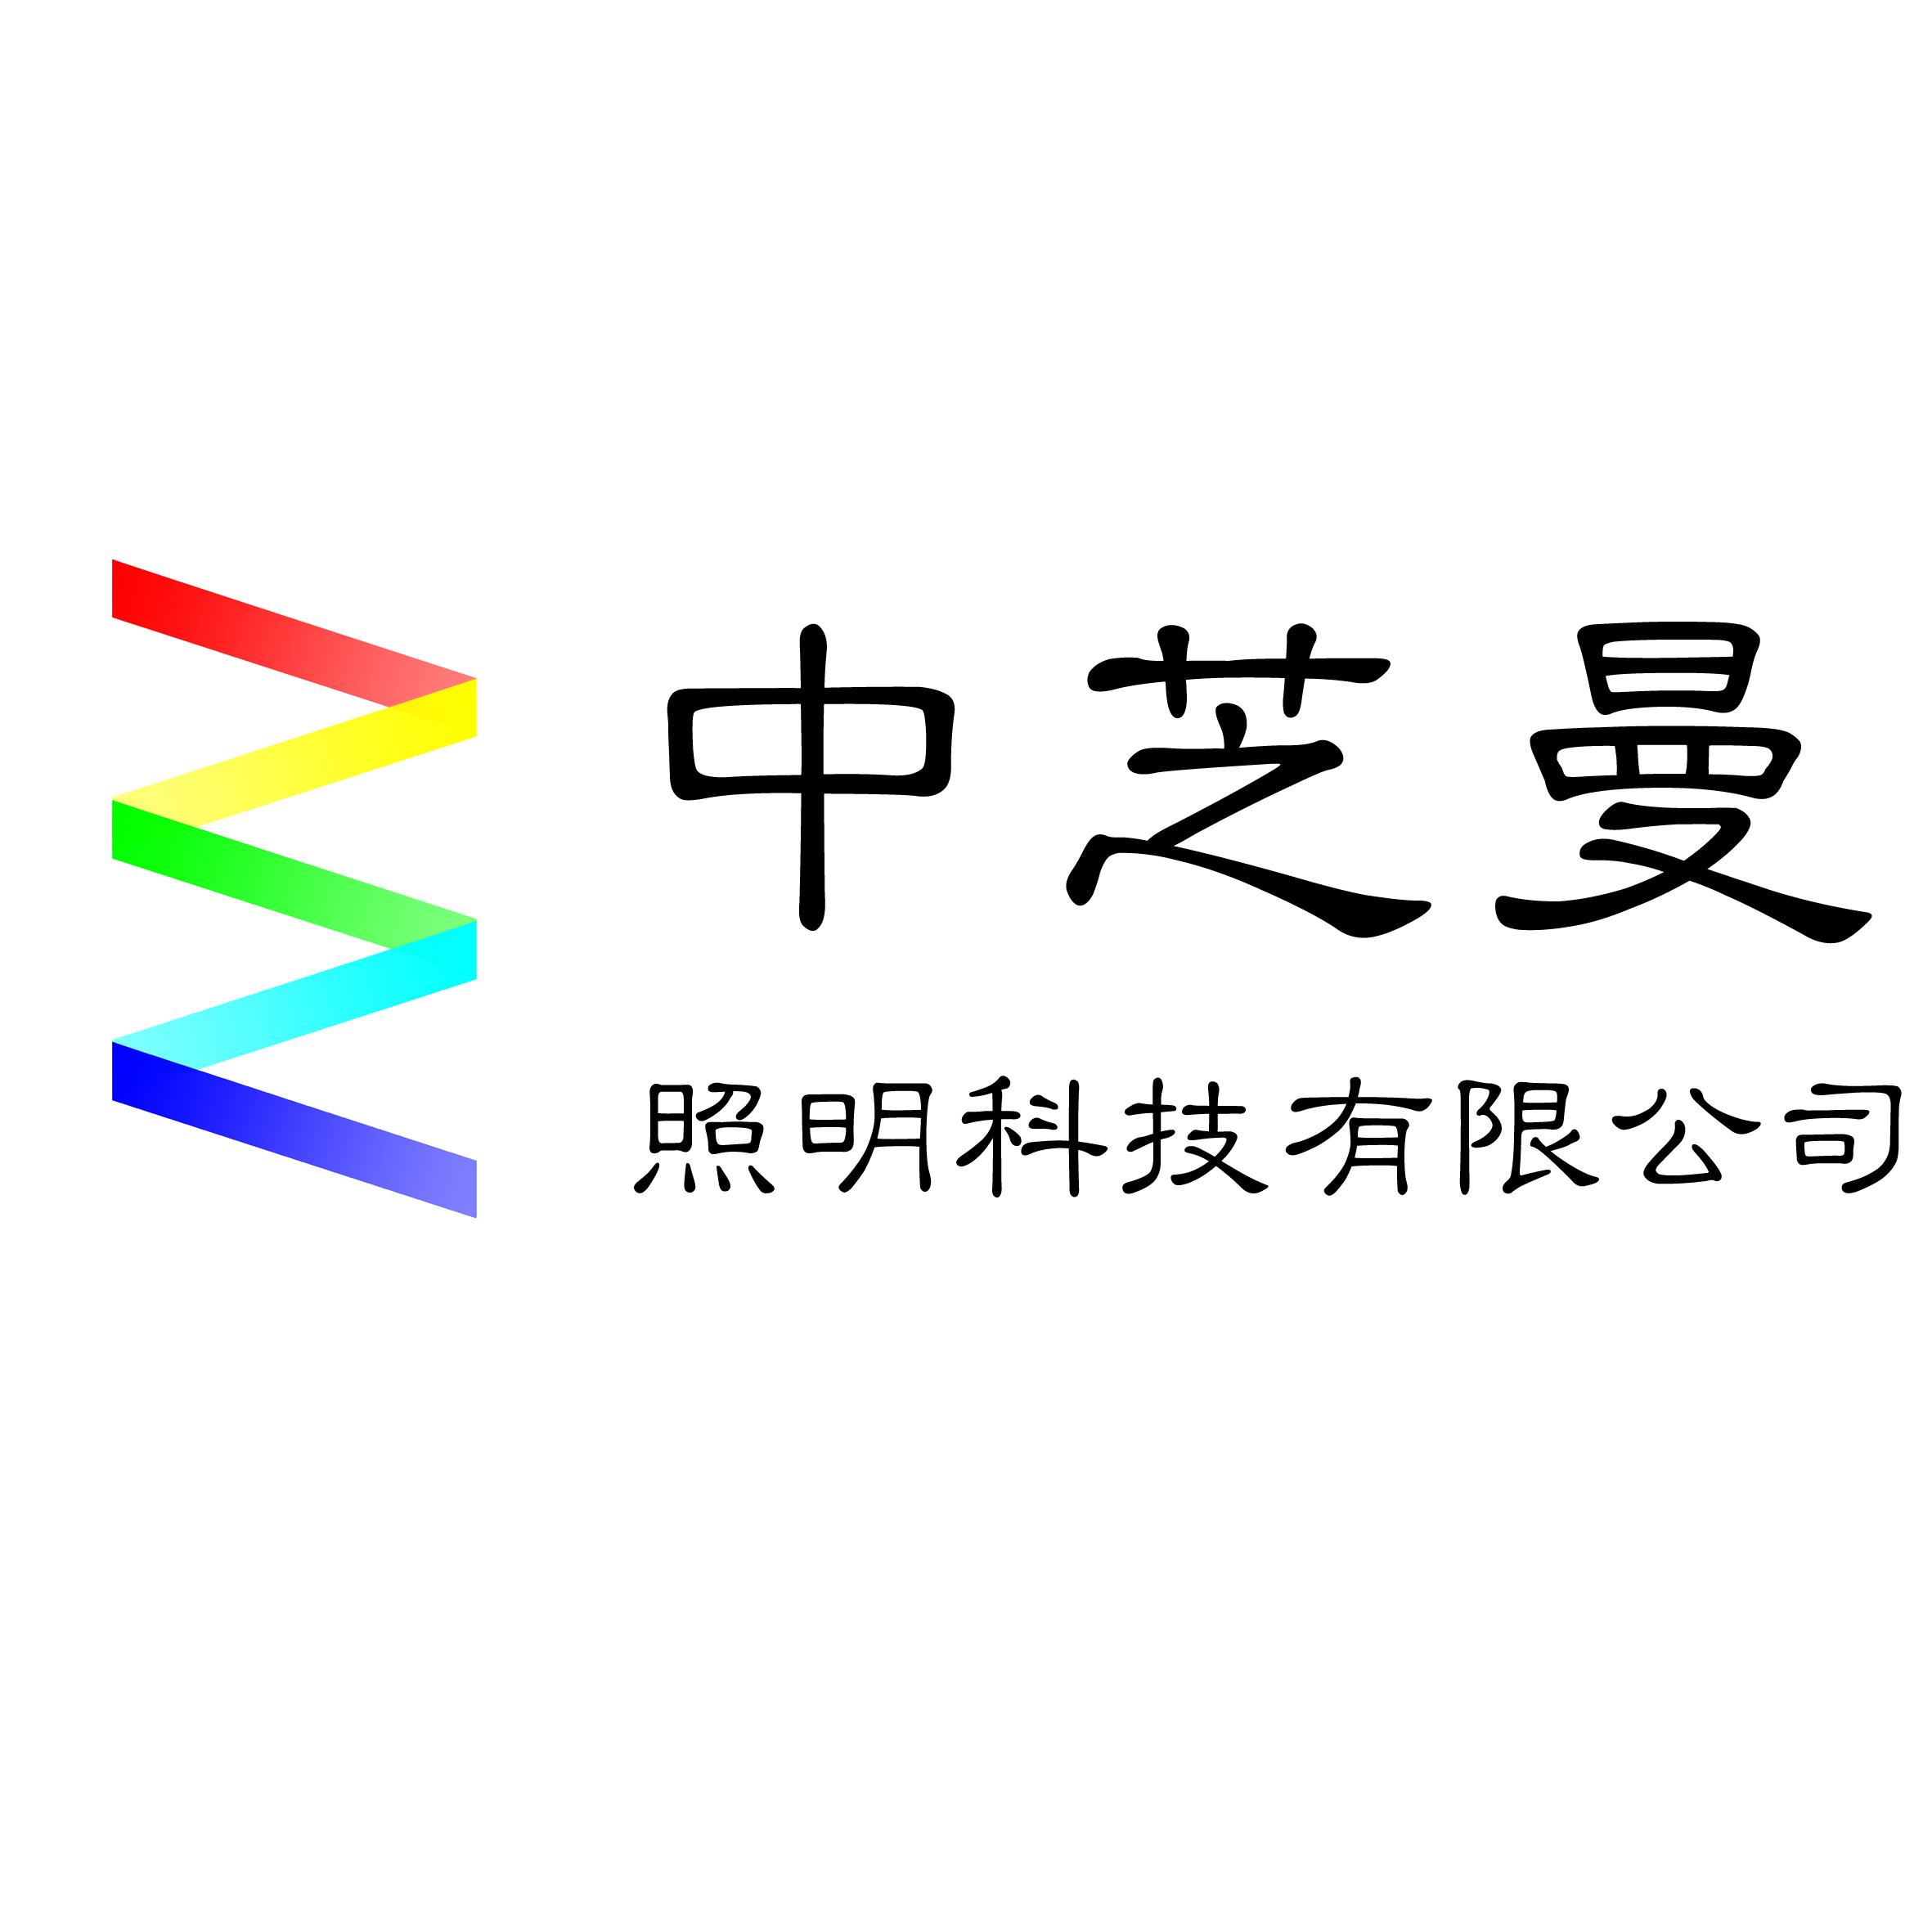 led照明科技公司logo和名片设计